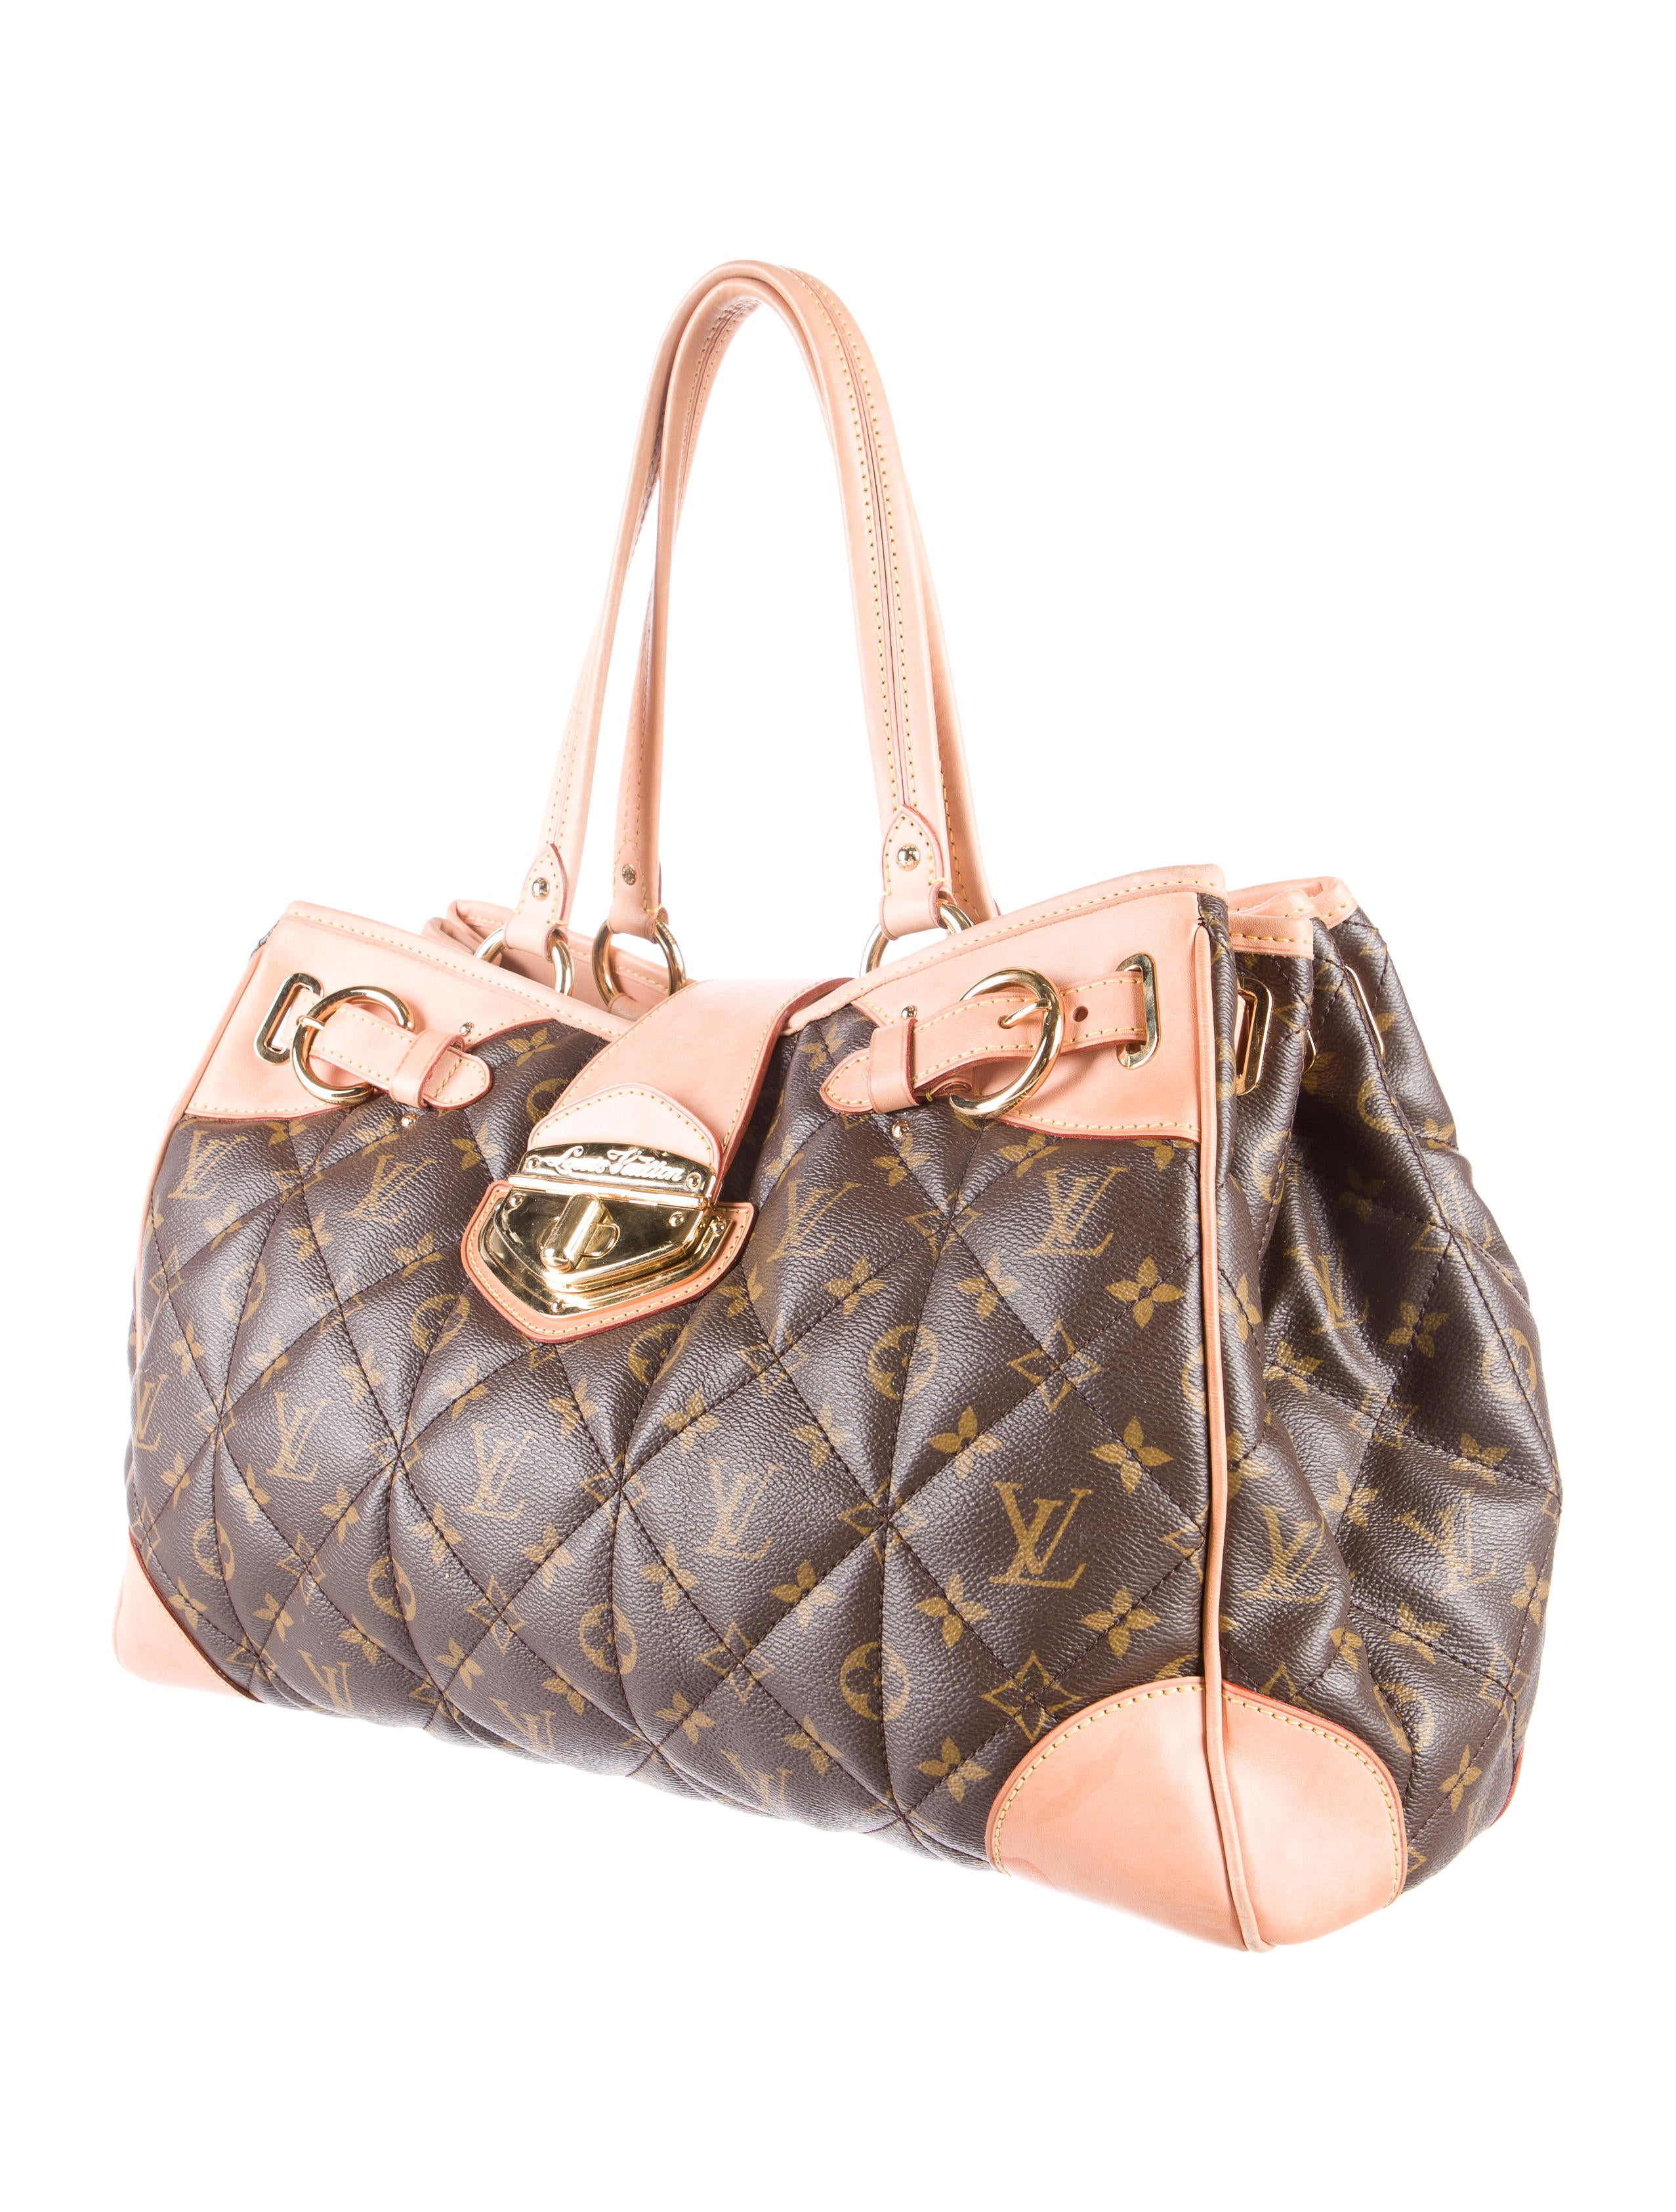 louis vuitton monogram etoile shopper handbags. Black Bedroom Furniture Sets. Home Design Ideas